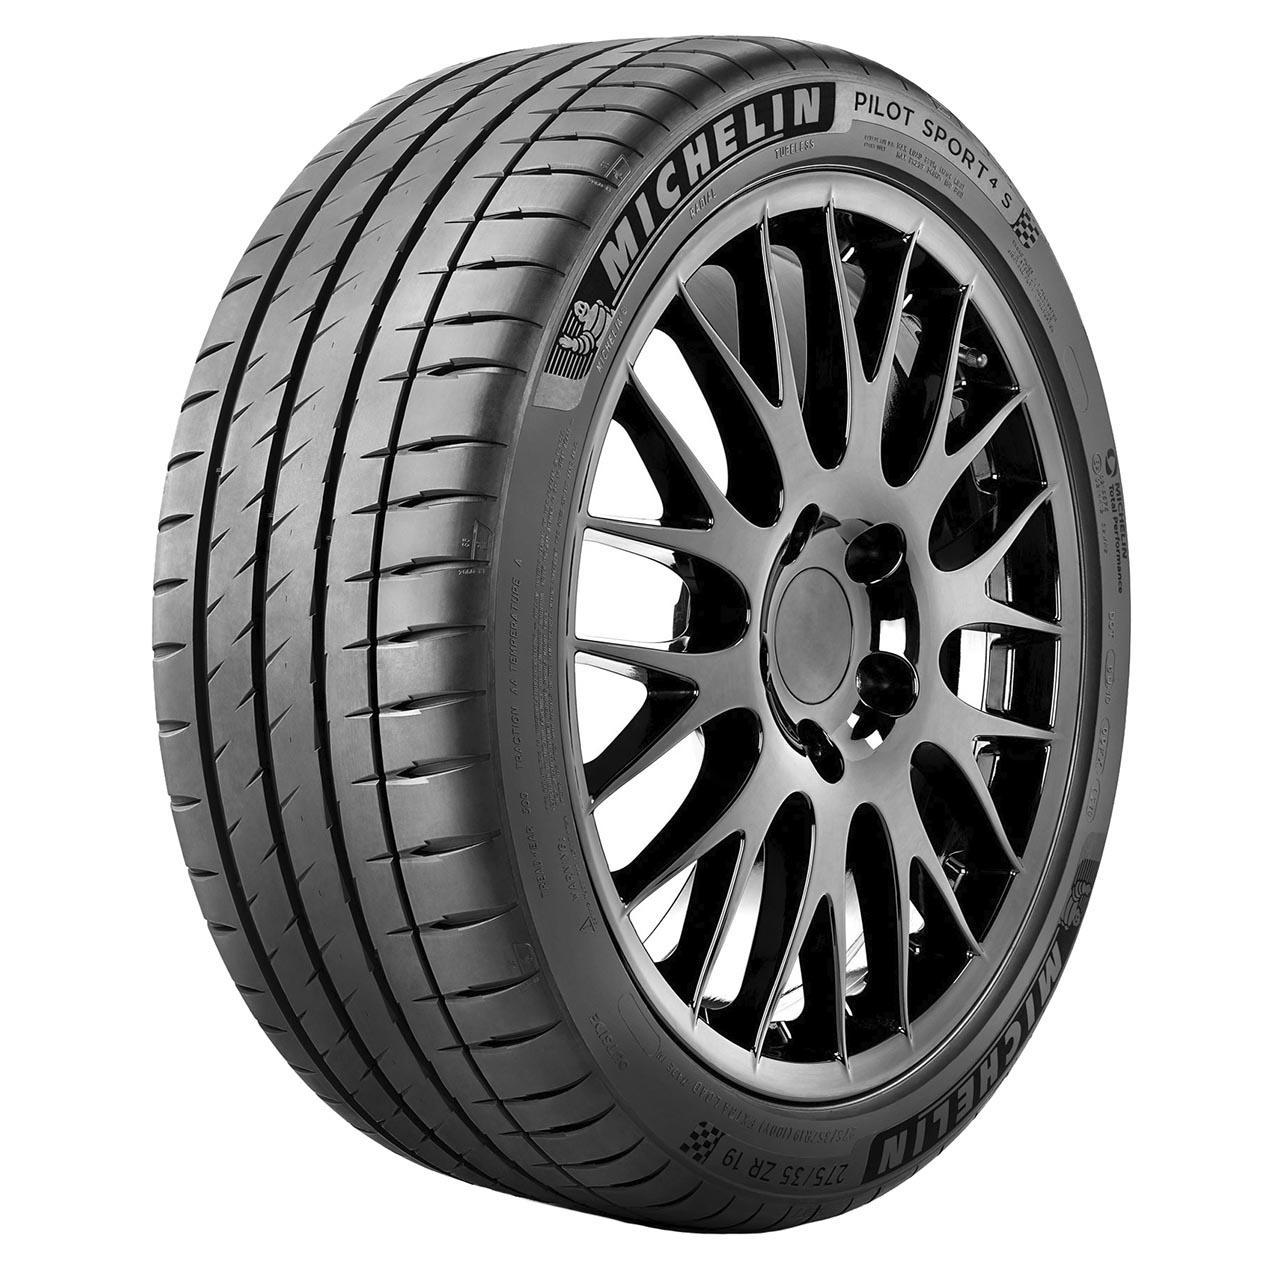 Michelin Pilot Sport 4 S 305/30ZR20 (103Y) XL N0